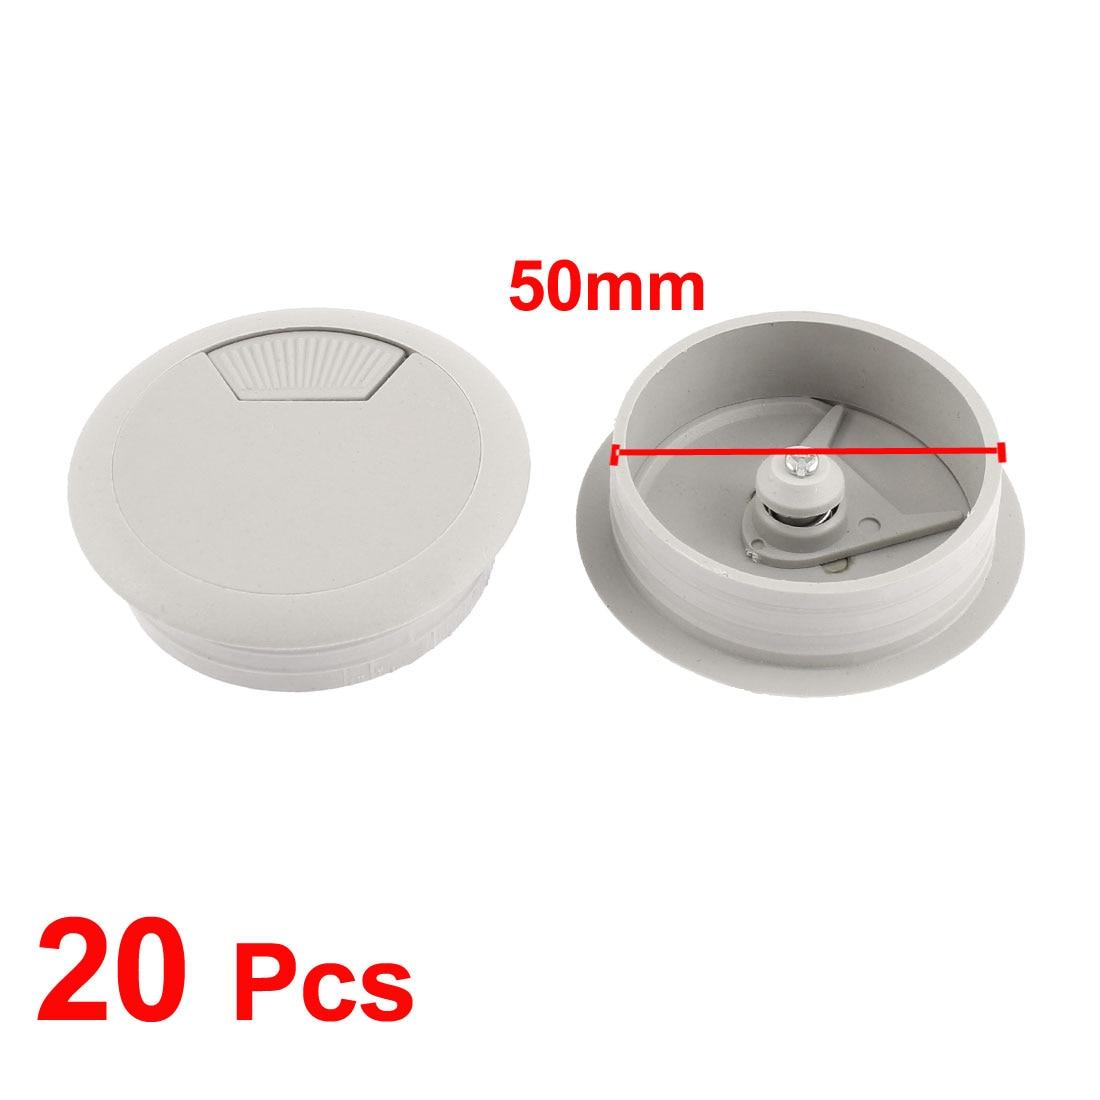 Computer PC Desk Plastic Round Grommet Wire Cable Hole Cover Gray 50mm Dia 20pcs